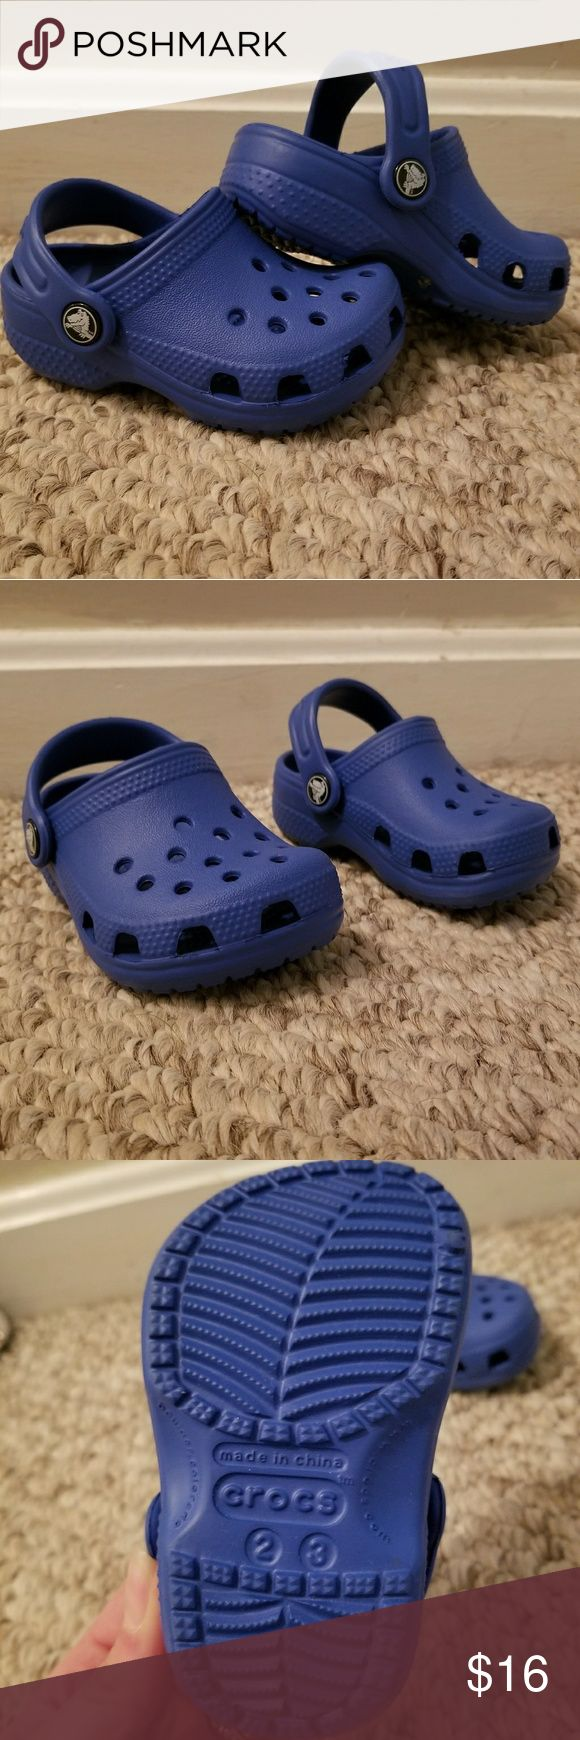 Toddler Blue Crocs Barely used toddler crocs. Size 2/3 as shown. CROCS Shoes Sandals & Flip Flops